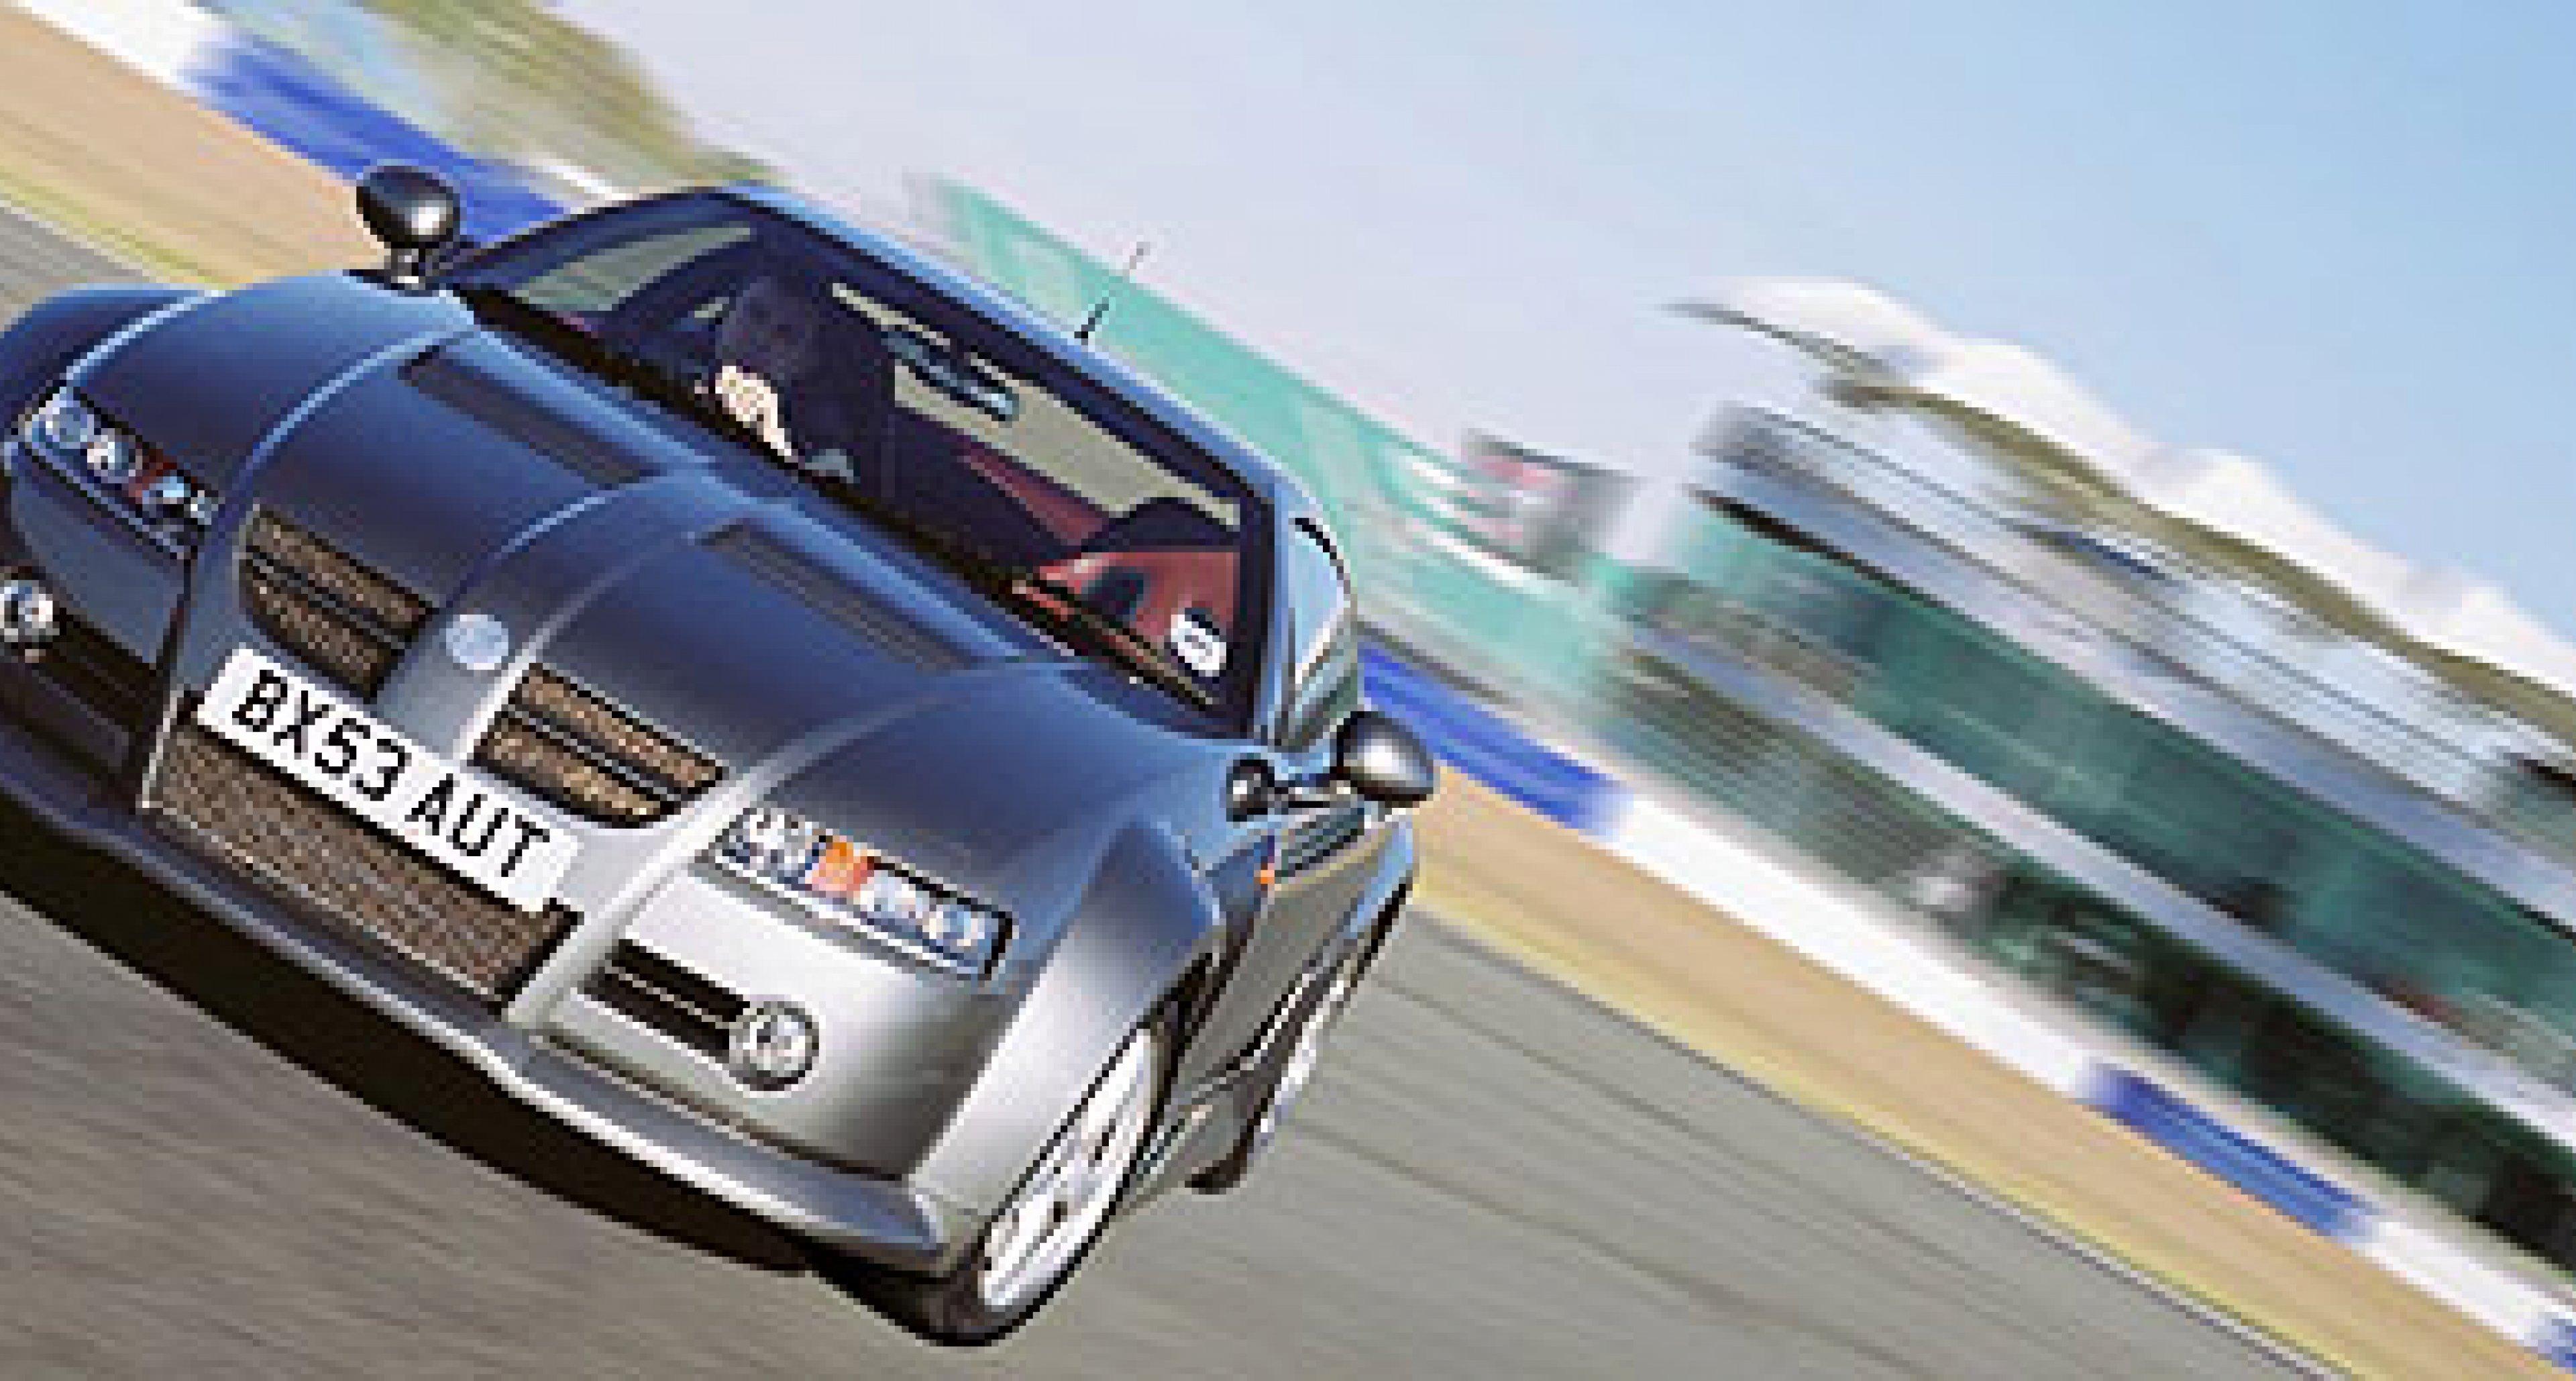 MG XPower SV ab 1. November 2003 erhältlich